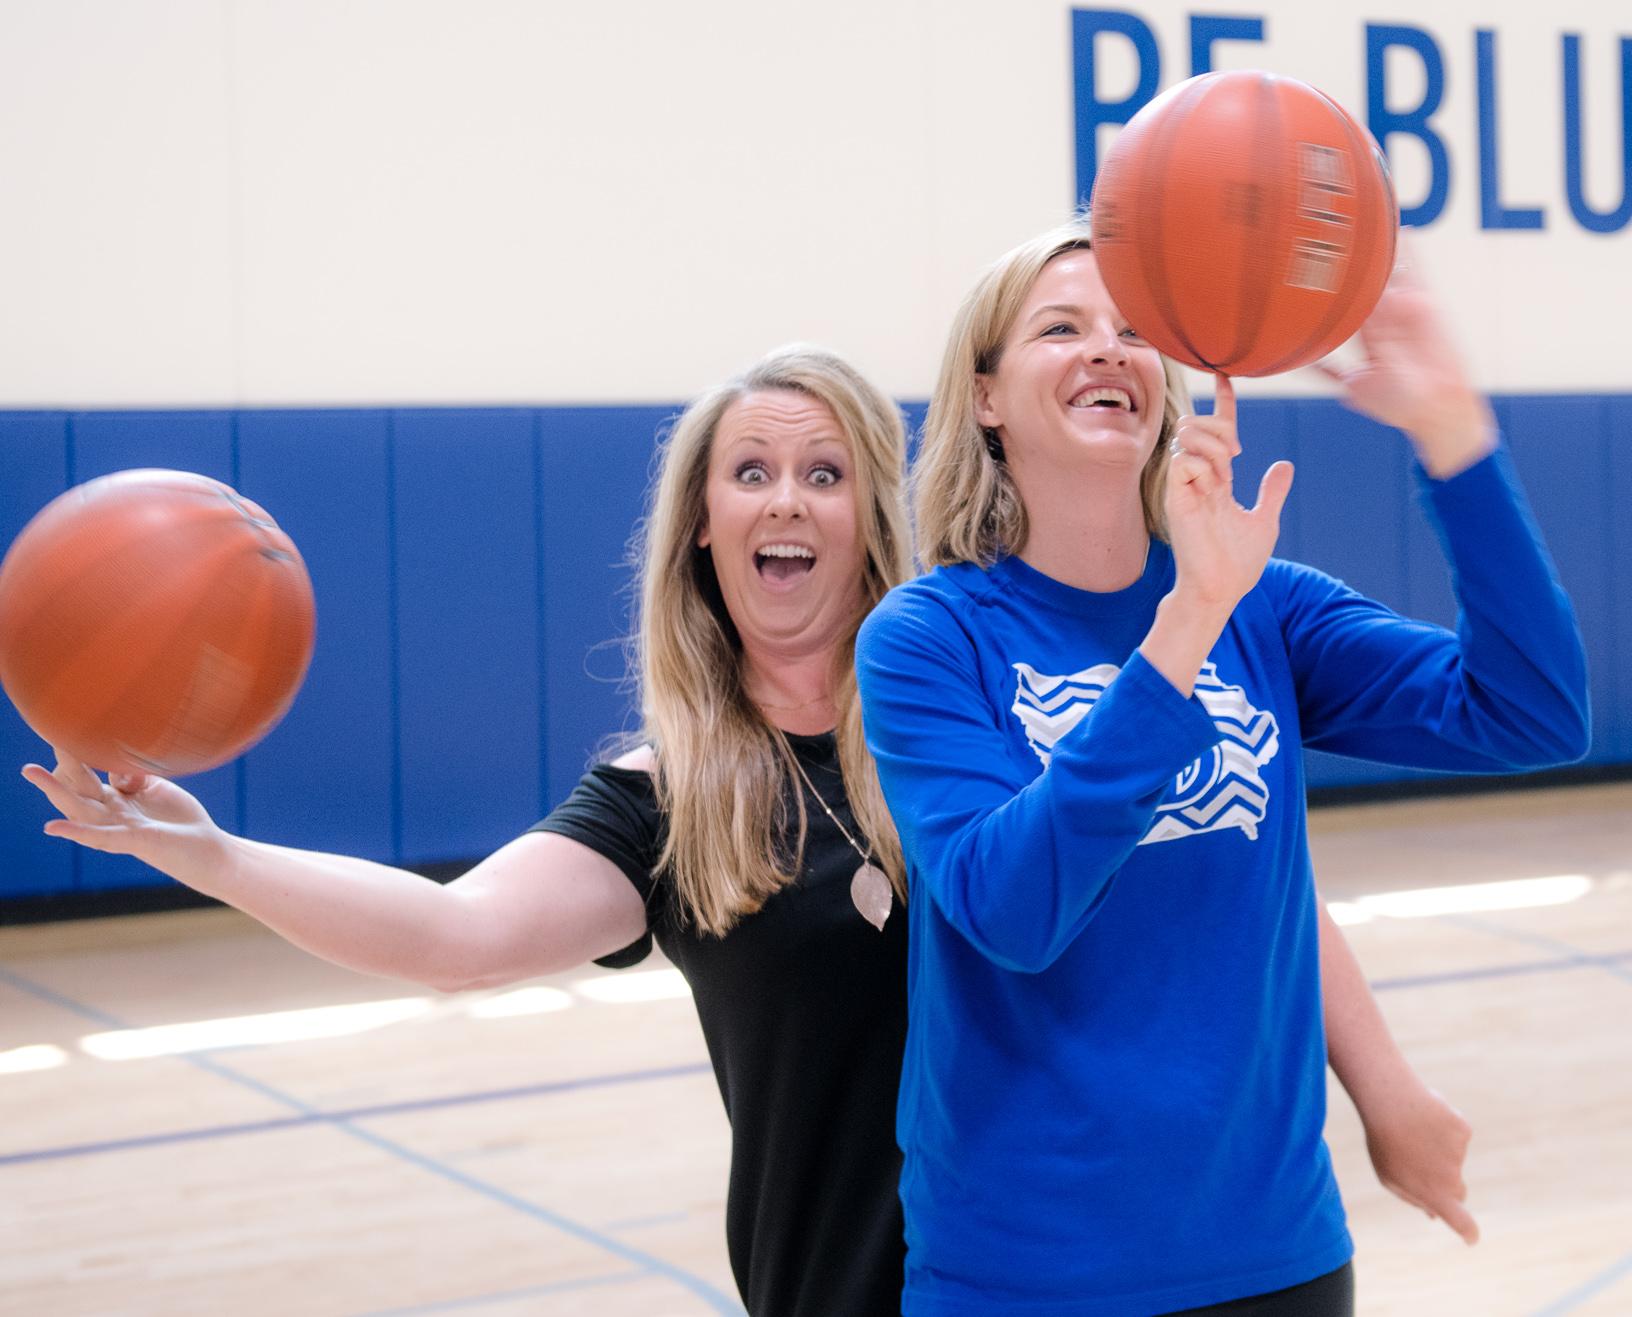 Jennie Baranczyk and Cristen Clark played basketball together at Dowling Catholic High School. Photo credit: Joseph L. Murphy/Iowa Soybean Association